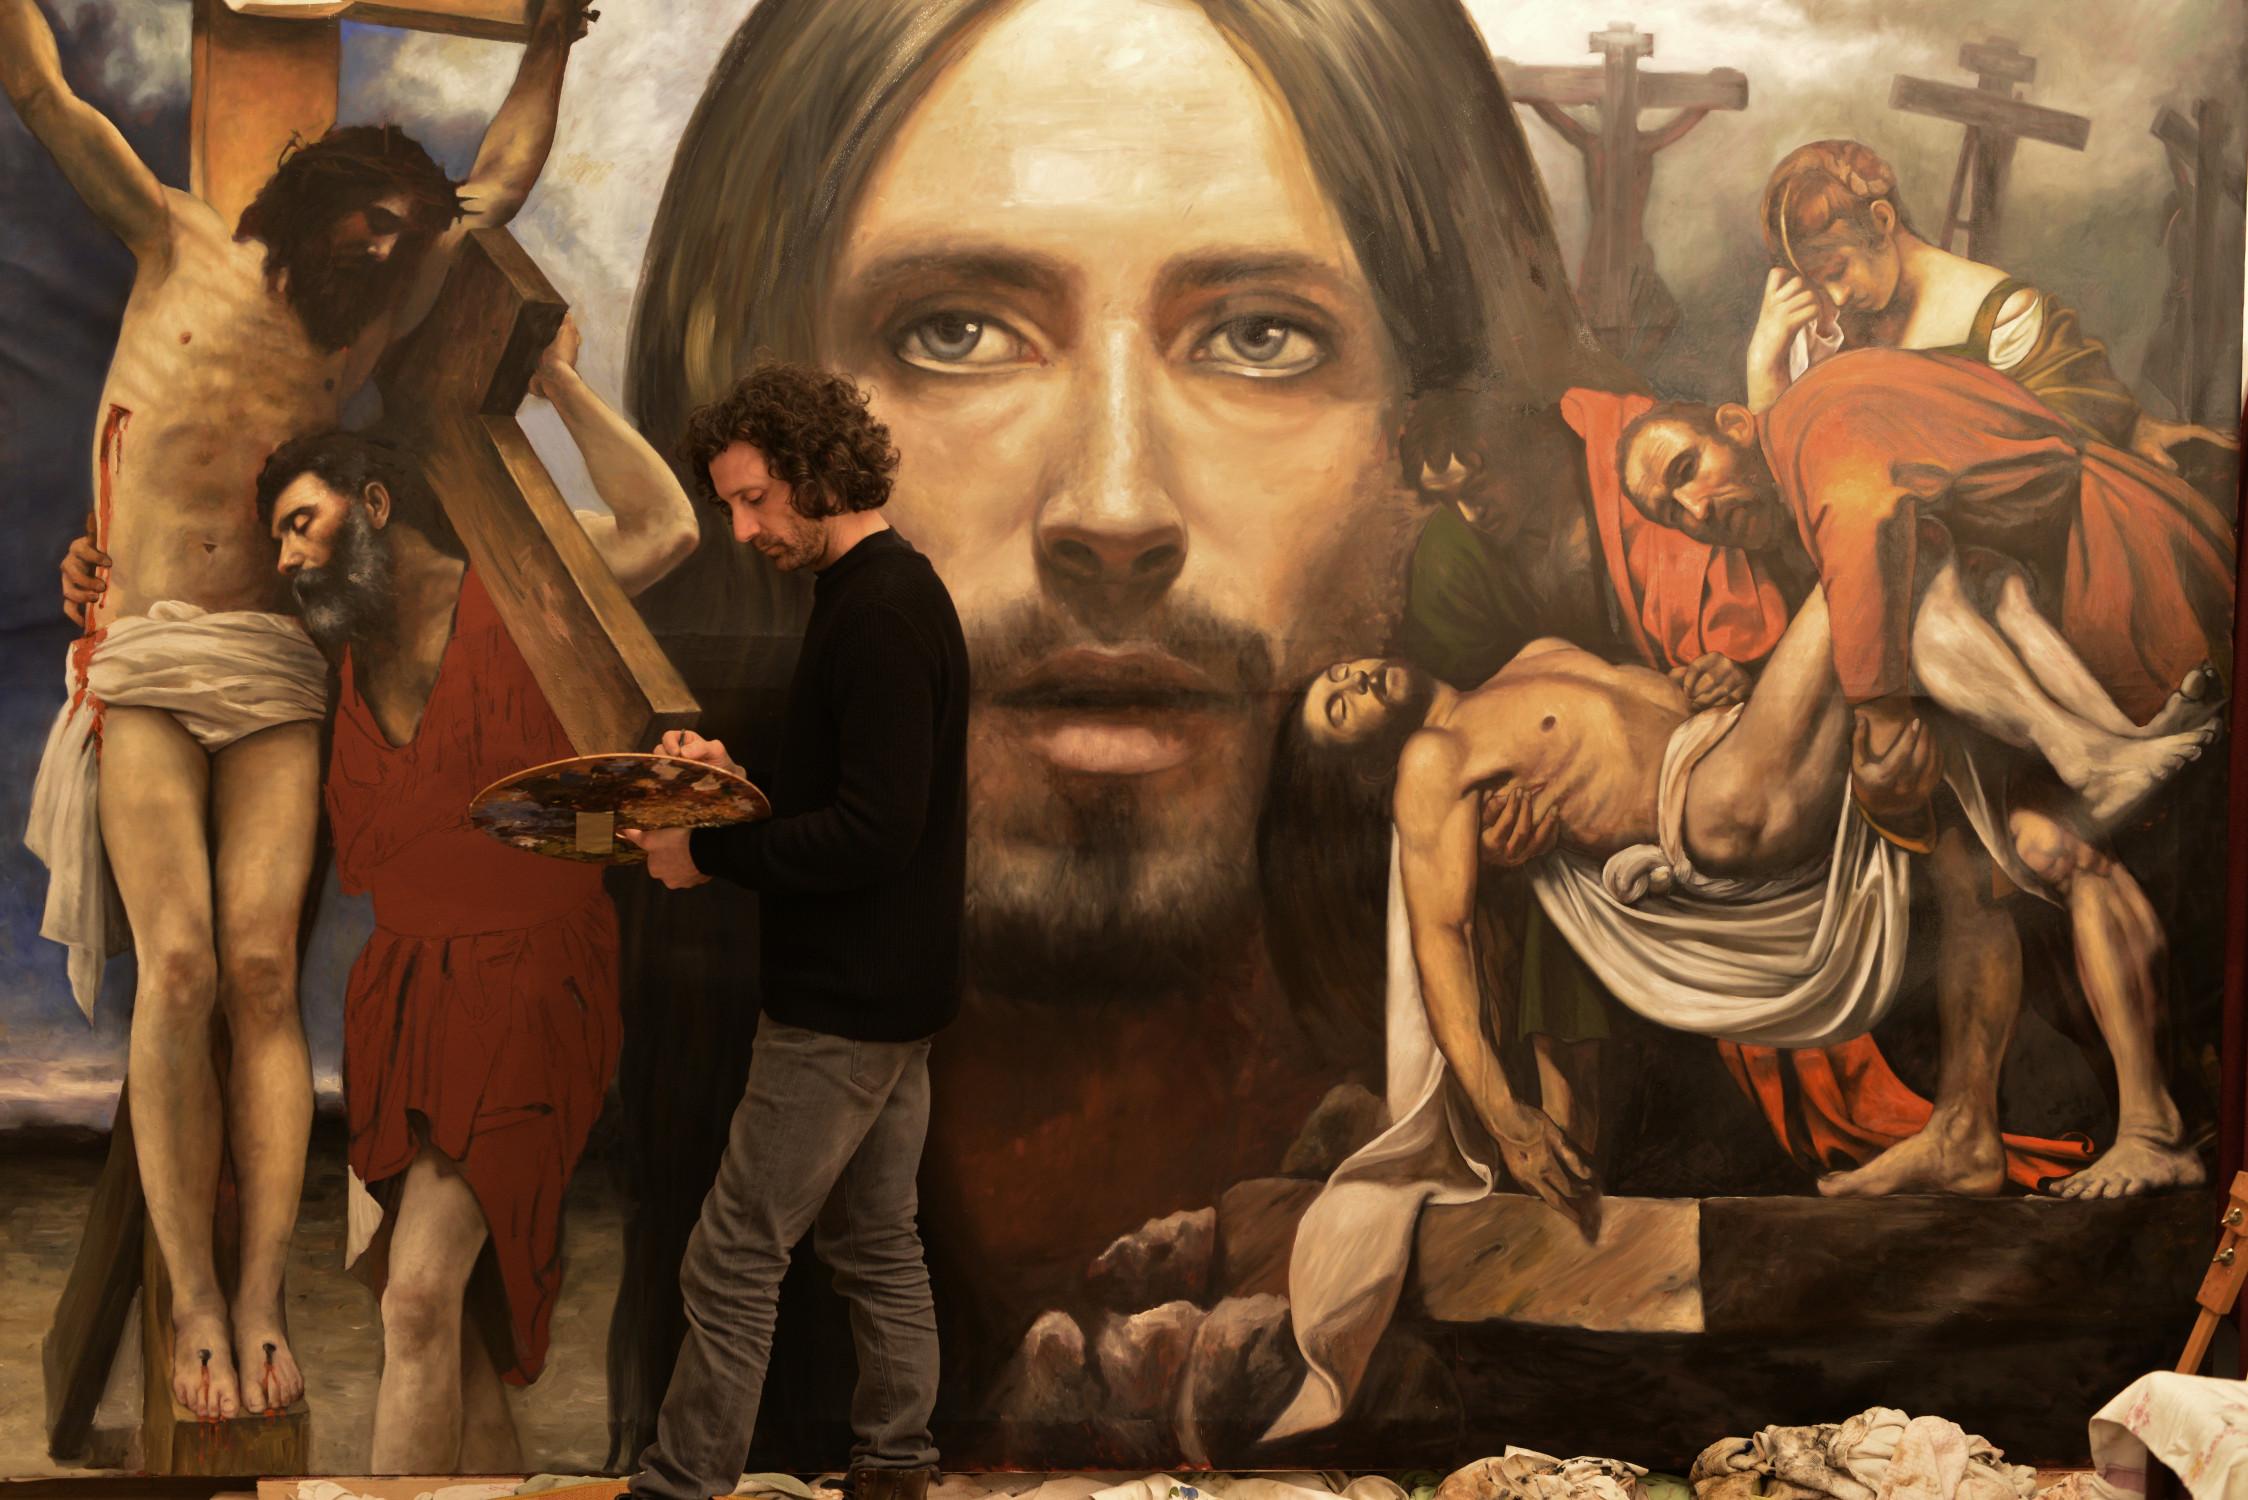 Sacred Commission, olio su tela, 250x350cm, 2018 work in progress